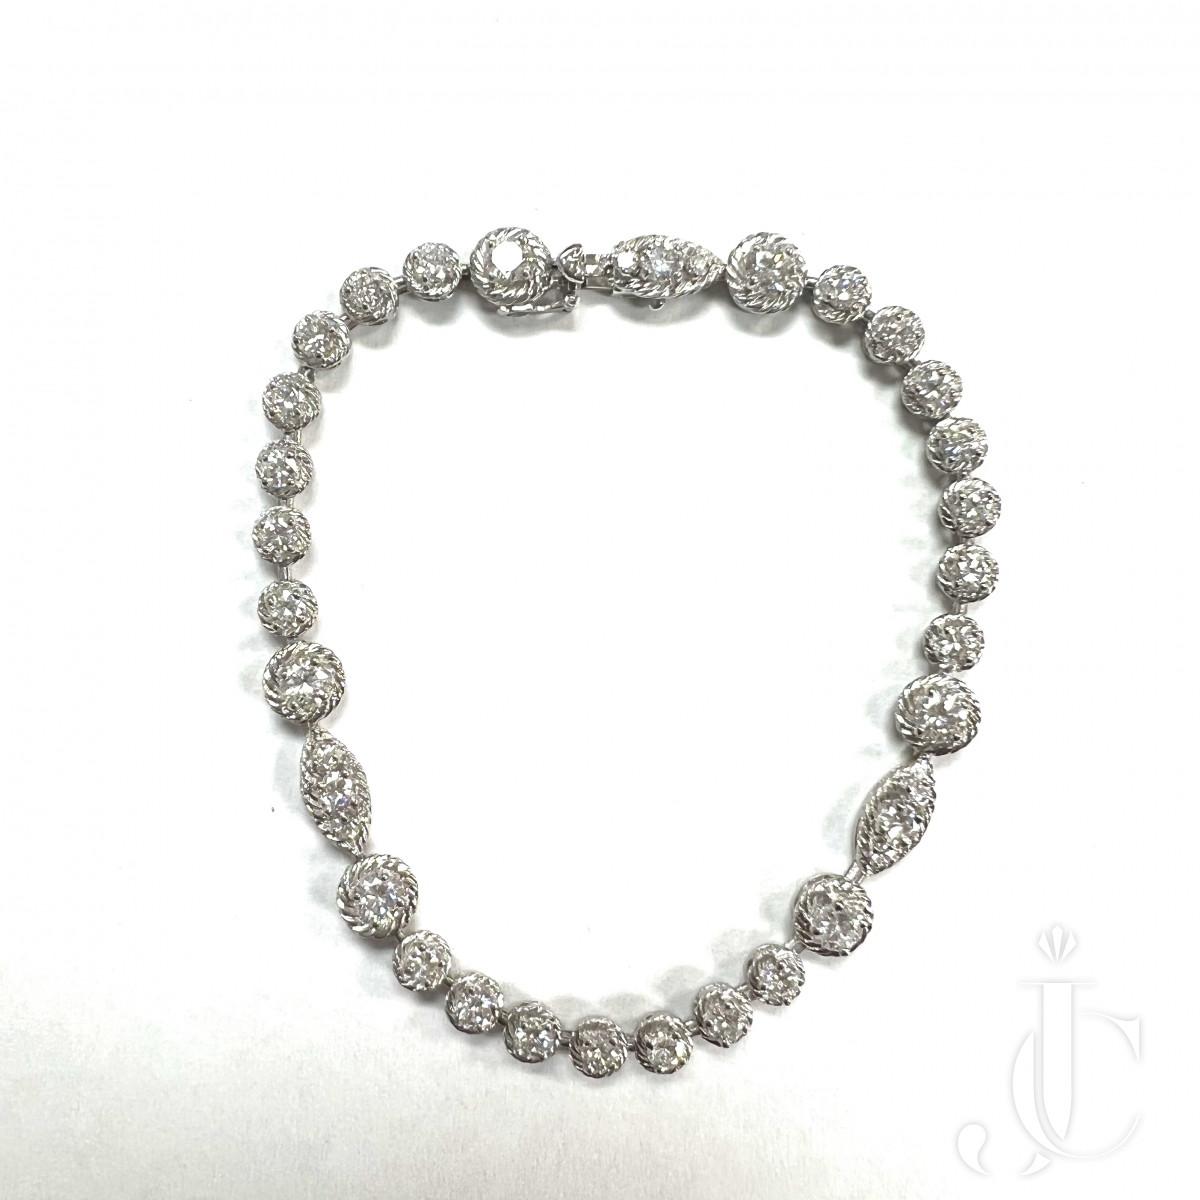 Van Cleef & Arpels Vintage Platinum and Diamond Bracelet